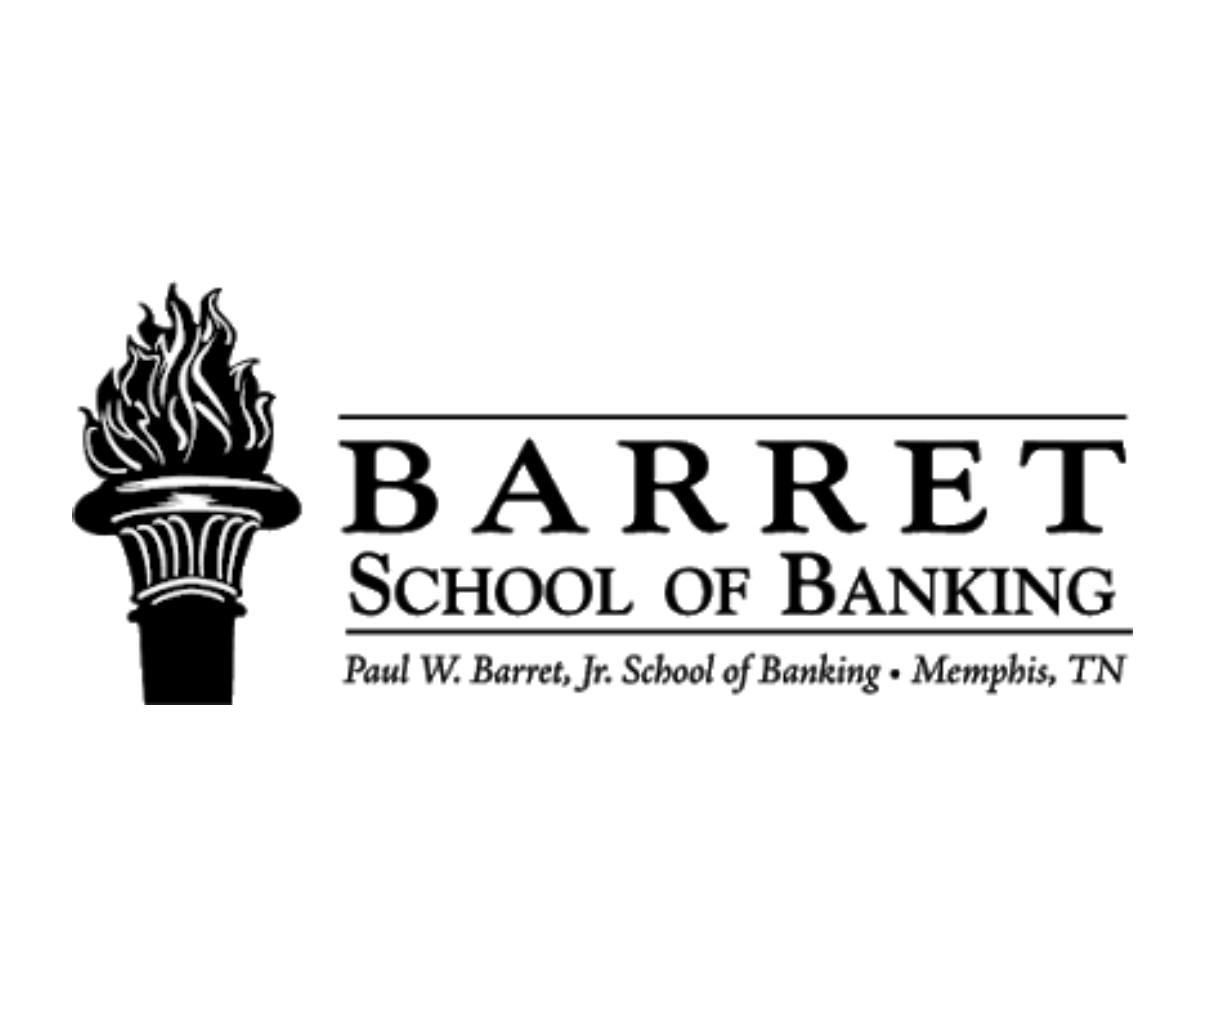 BarretSchoolBanking-Logo-ConventionSponsor-Reel-4